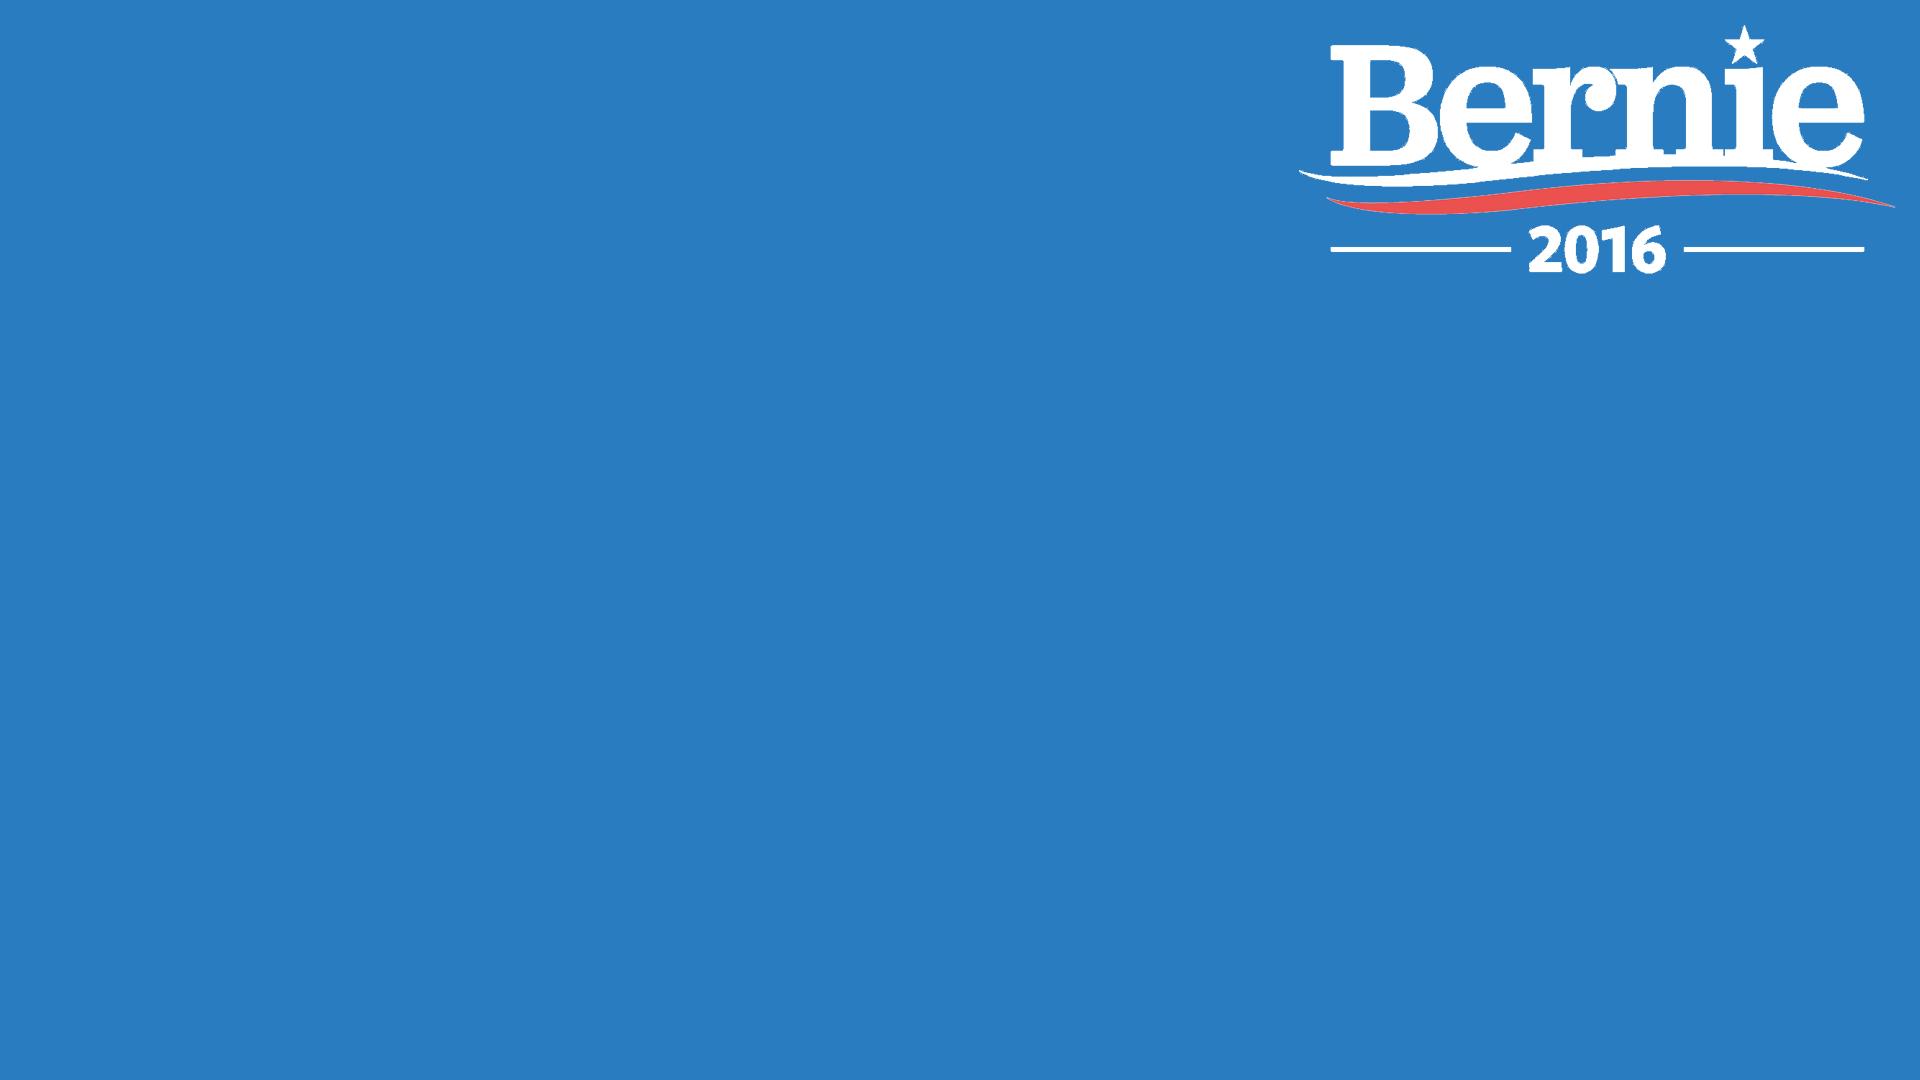 Bernie Sanders Wallpaper Download: DNNC 2016 Wallpapers